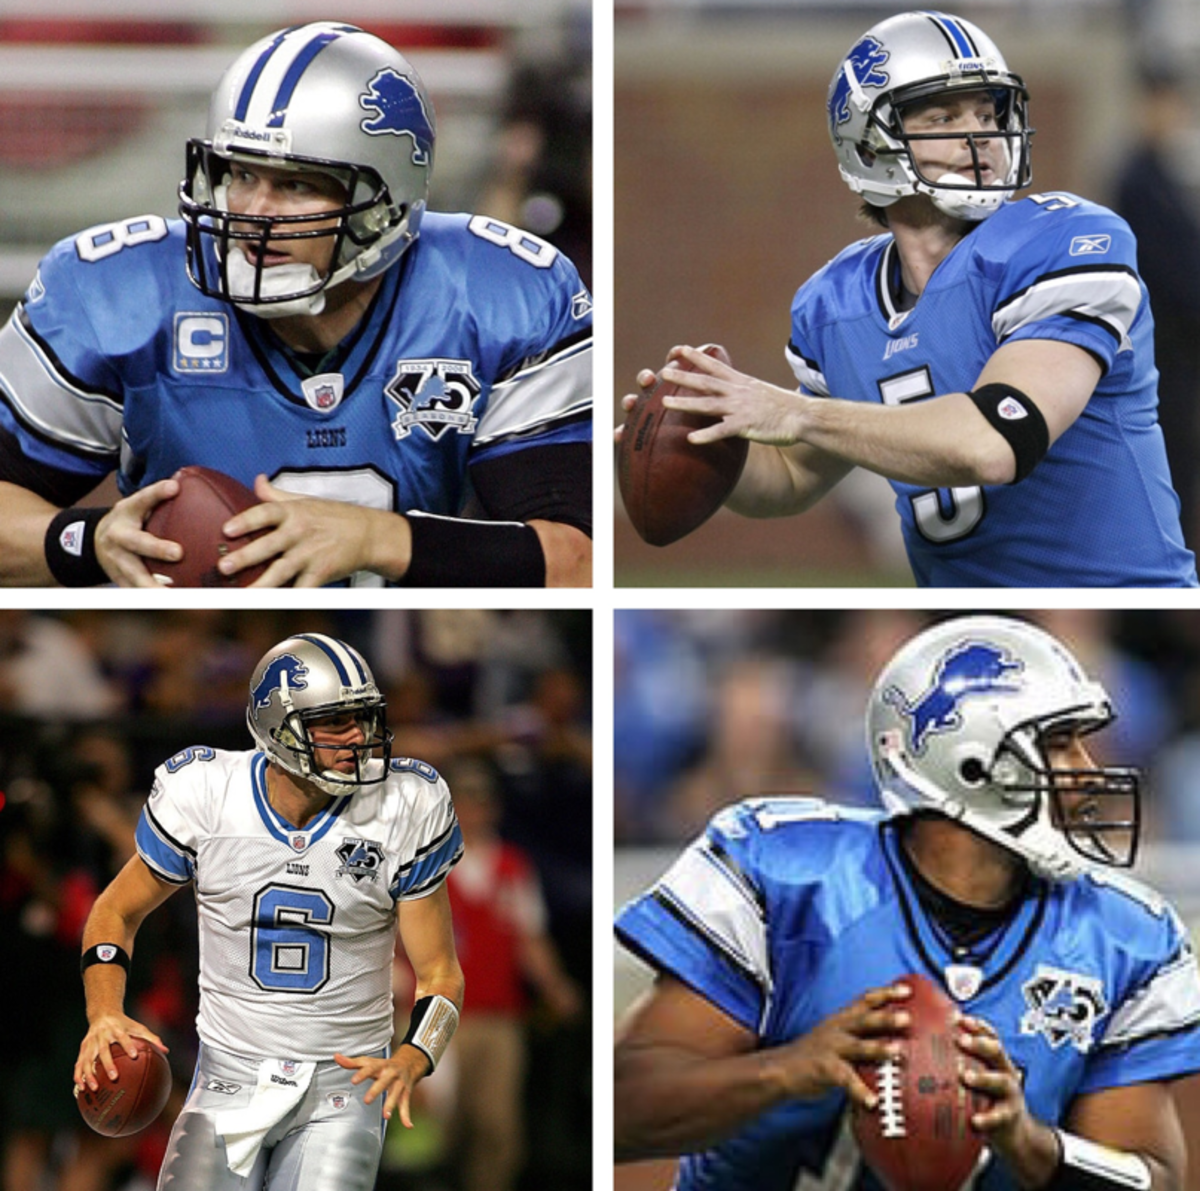 2008 Lion's quarterbacks(clockwise from top left): Jon Kitna, Drew Stanton, Daunte Culpepper, Dan Orlovsky